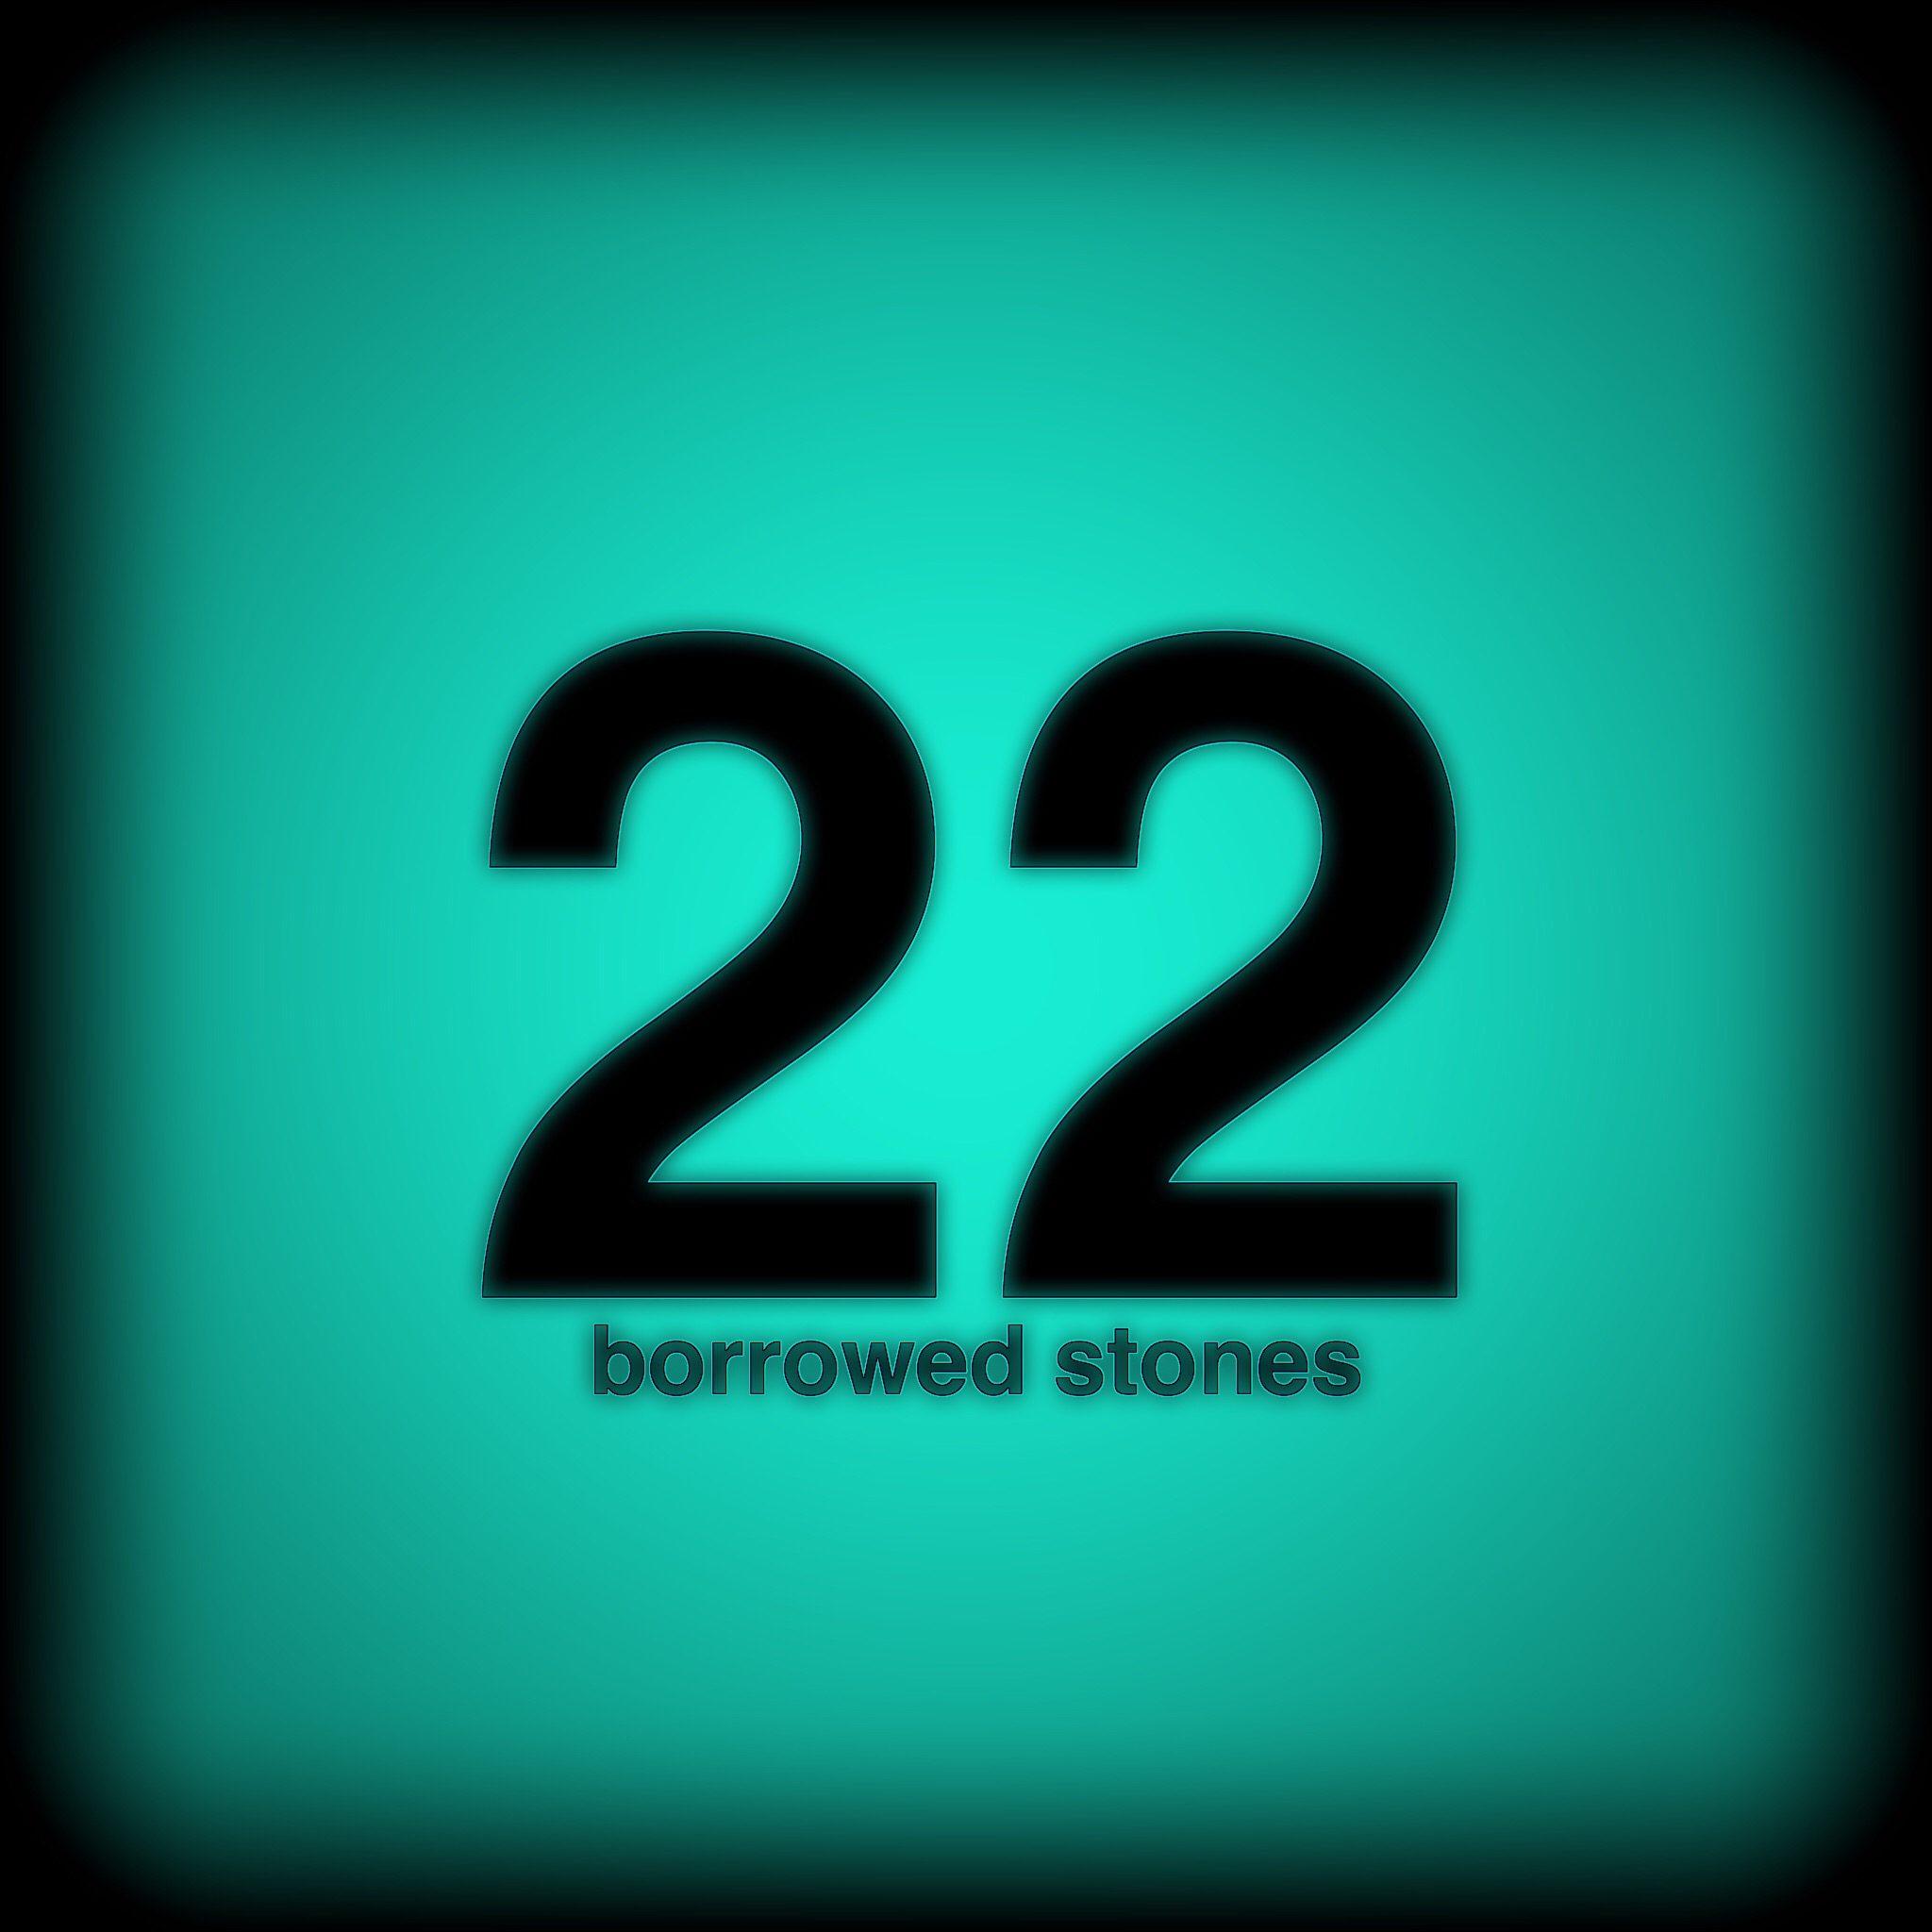 TwentyTwo Borrowed Stones